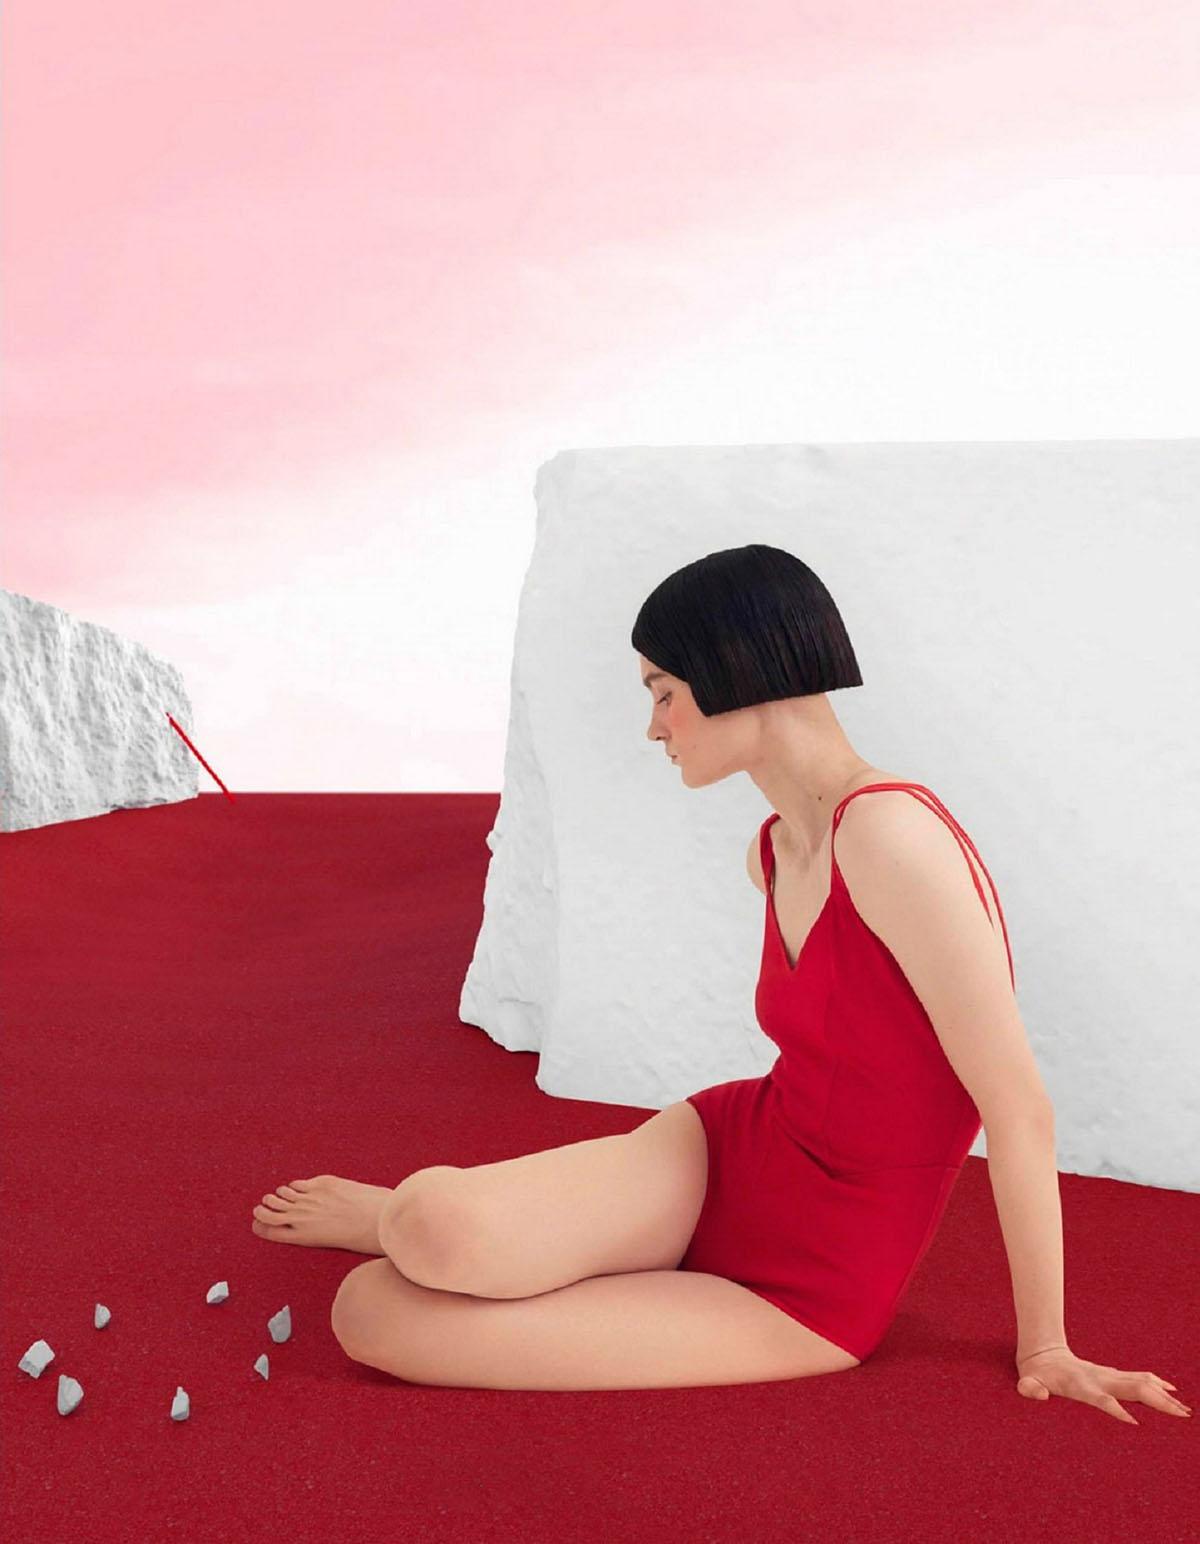 Tanya Churbanova covers Vogue Russia March 2021 by Yan Yugay